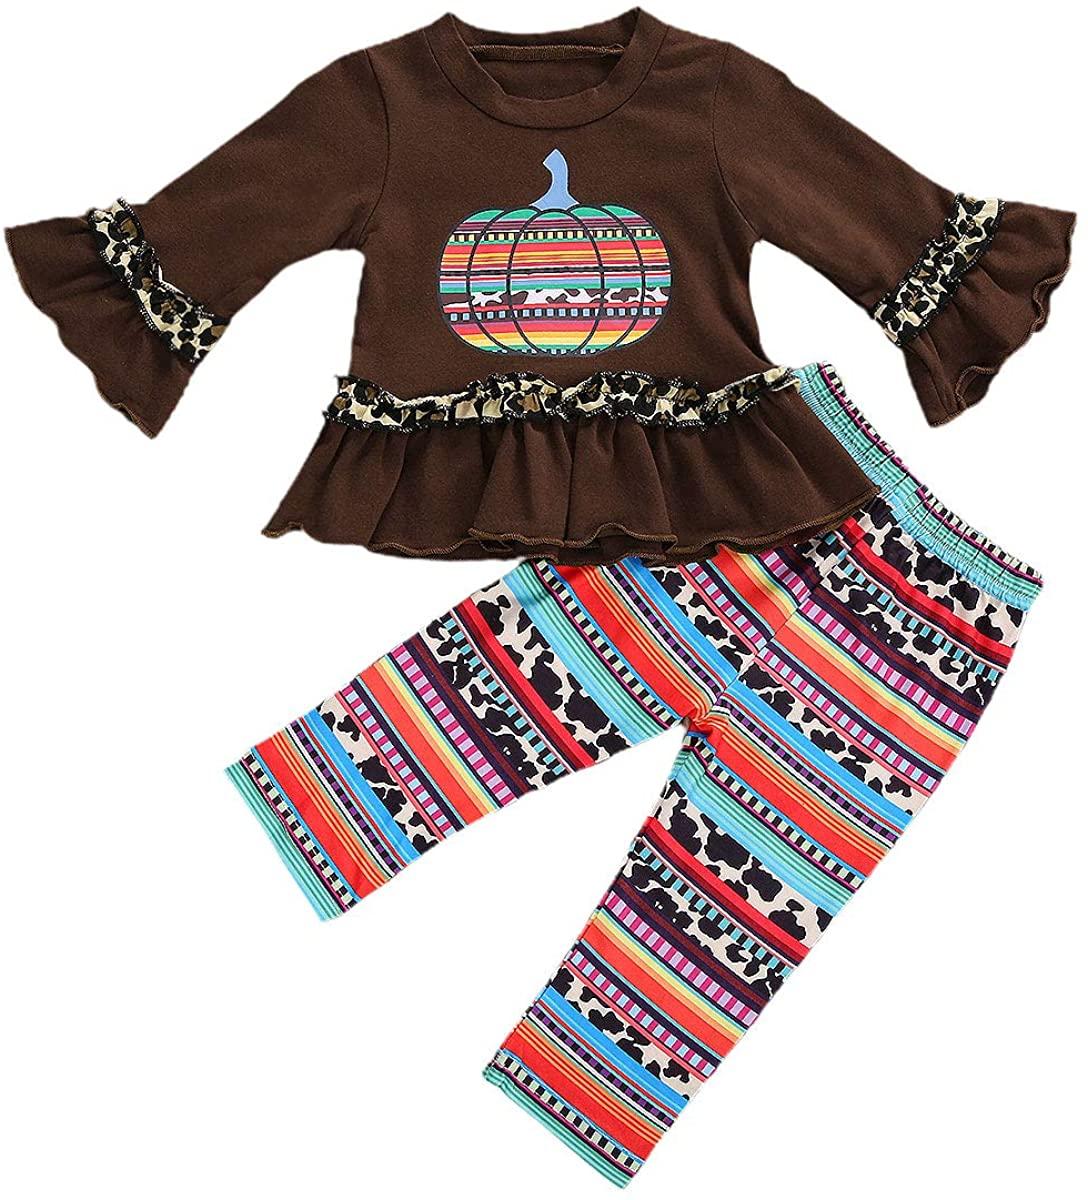 Toddler Girl Halloween Clothes Long Sleeve Ruffle T-Shirt Top Pumpkin Pants Set Halloween Outfit 2Pcs